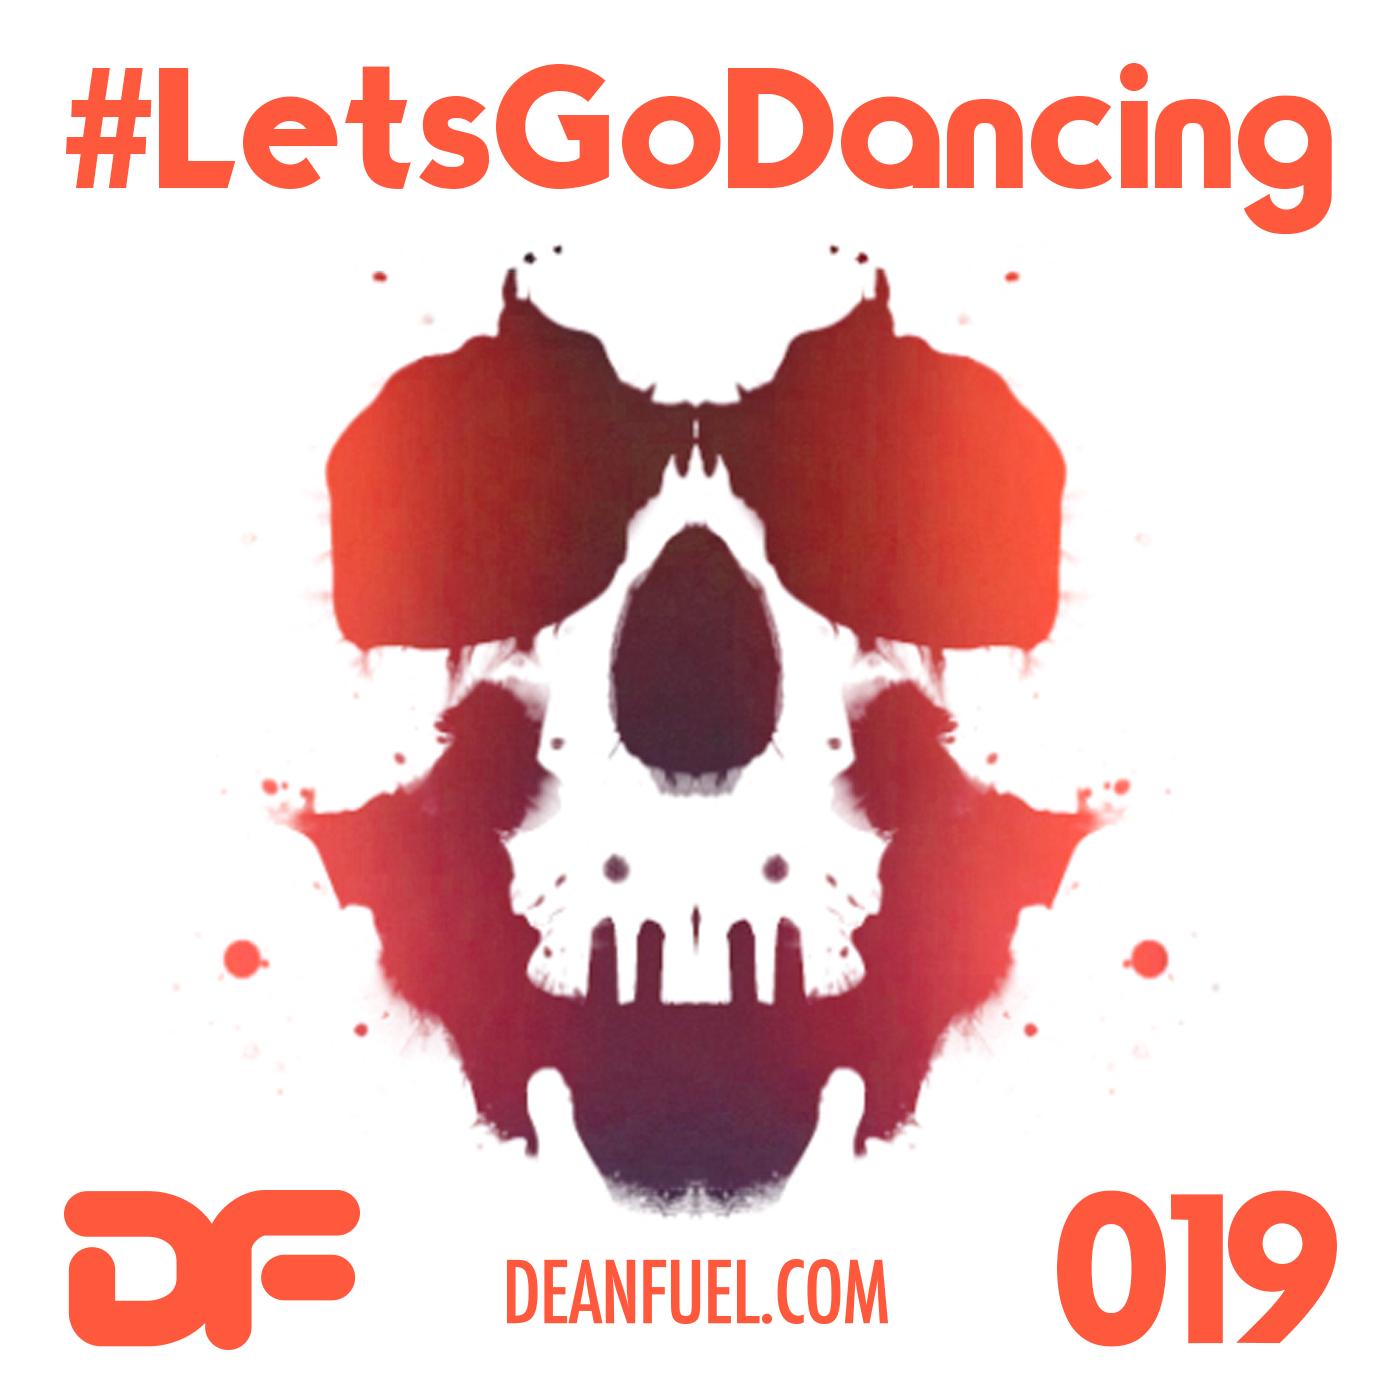 DEAN FUEL - Lets Go Dancing Image